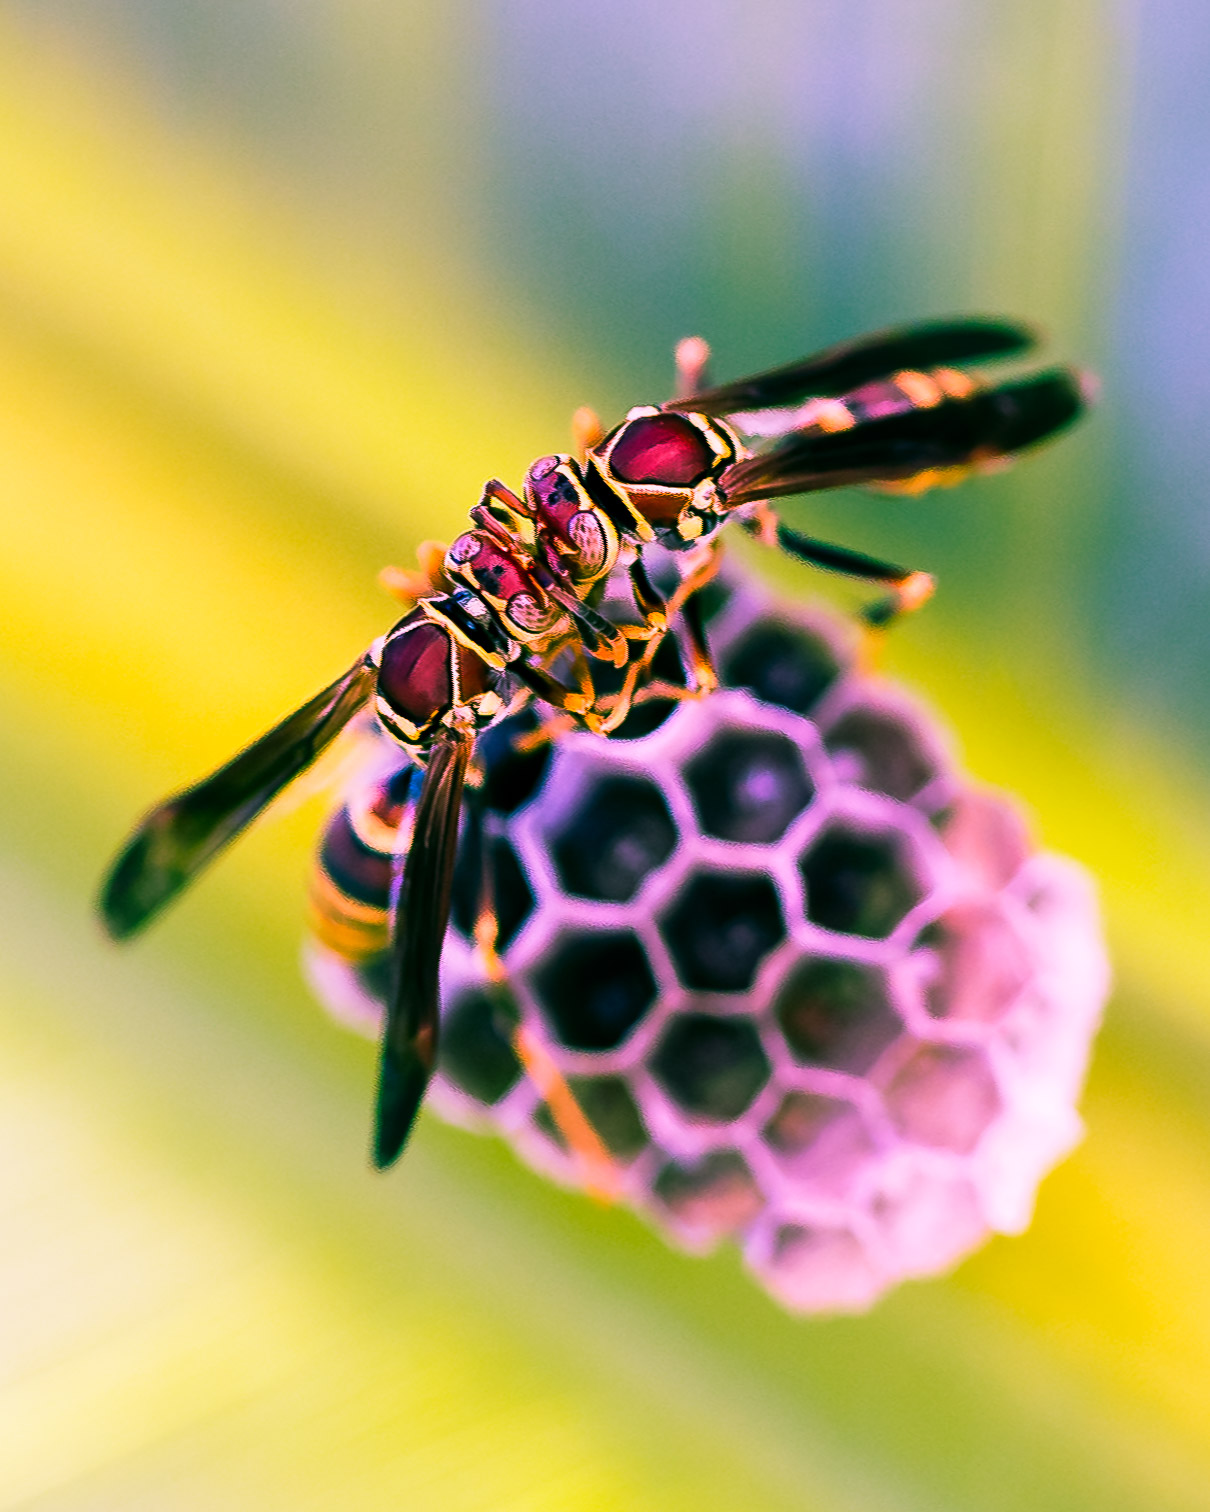 alexa-wright-color-photography-wasps.jpg